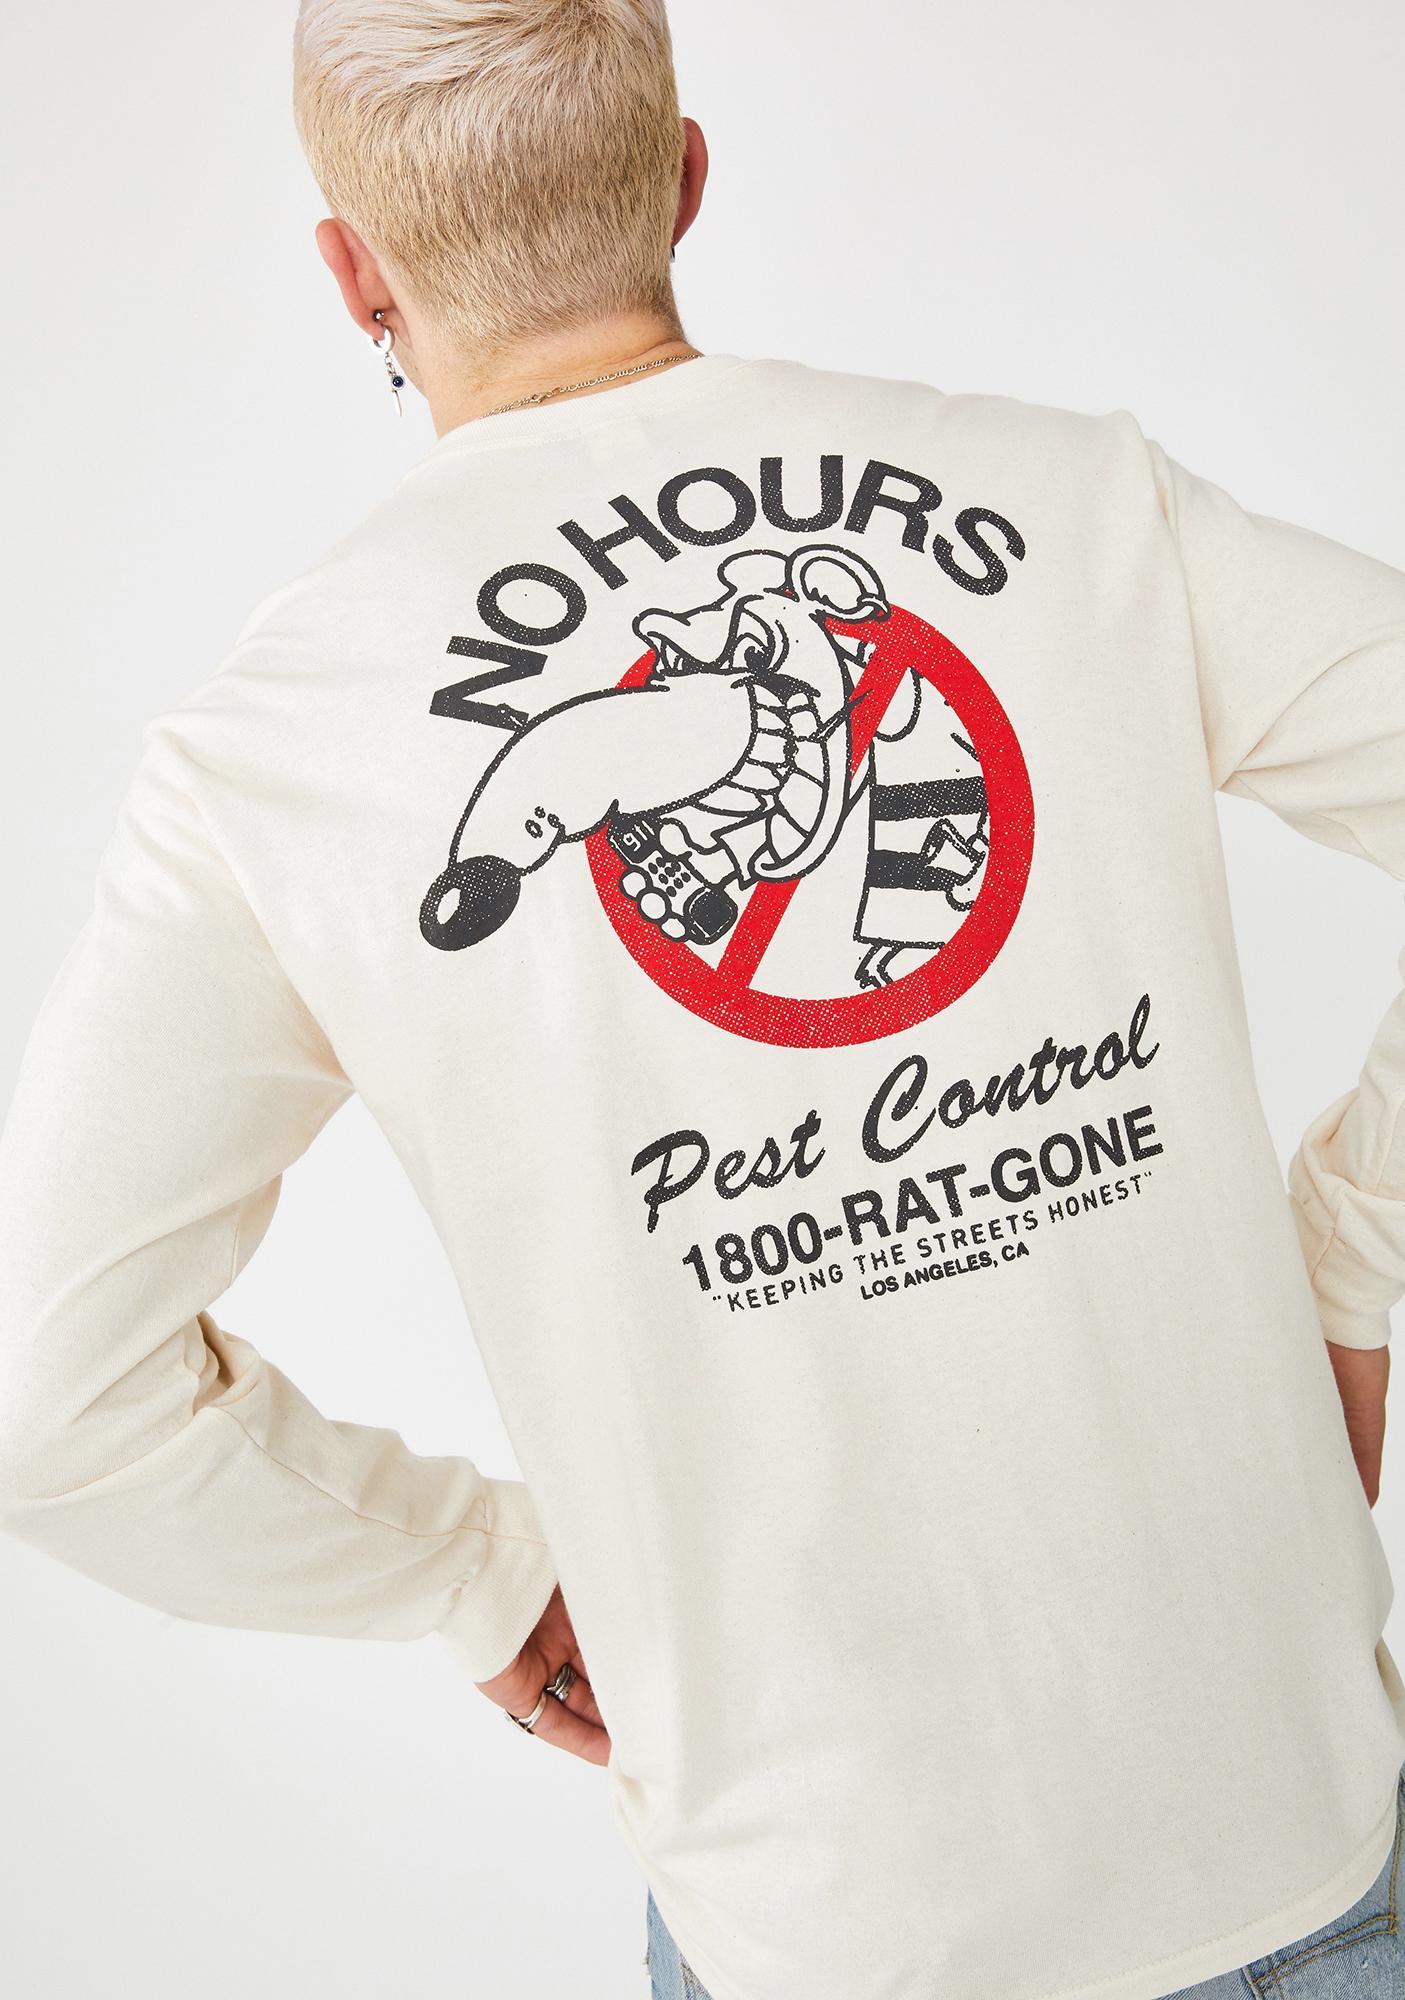 No Hours Rat Gone Long Sleeve Tee